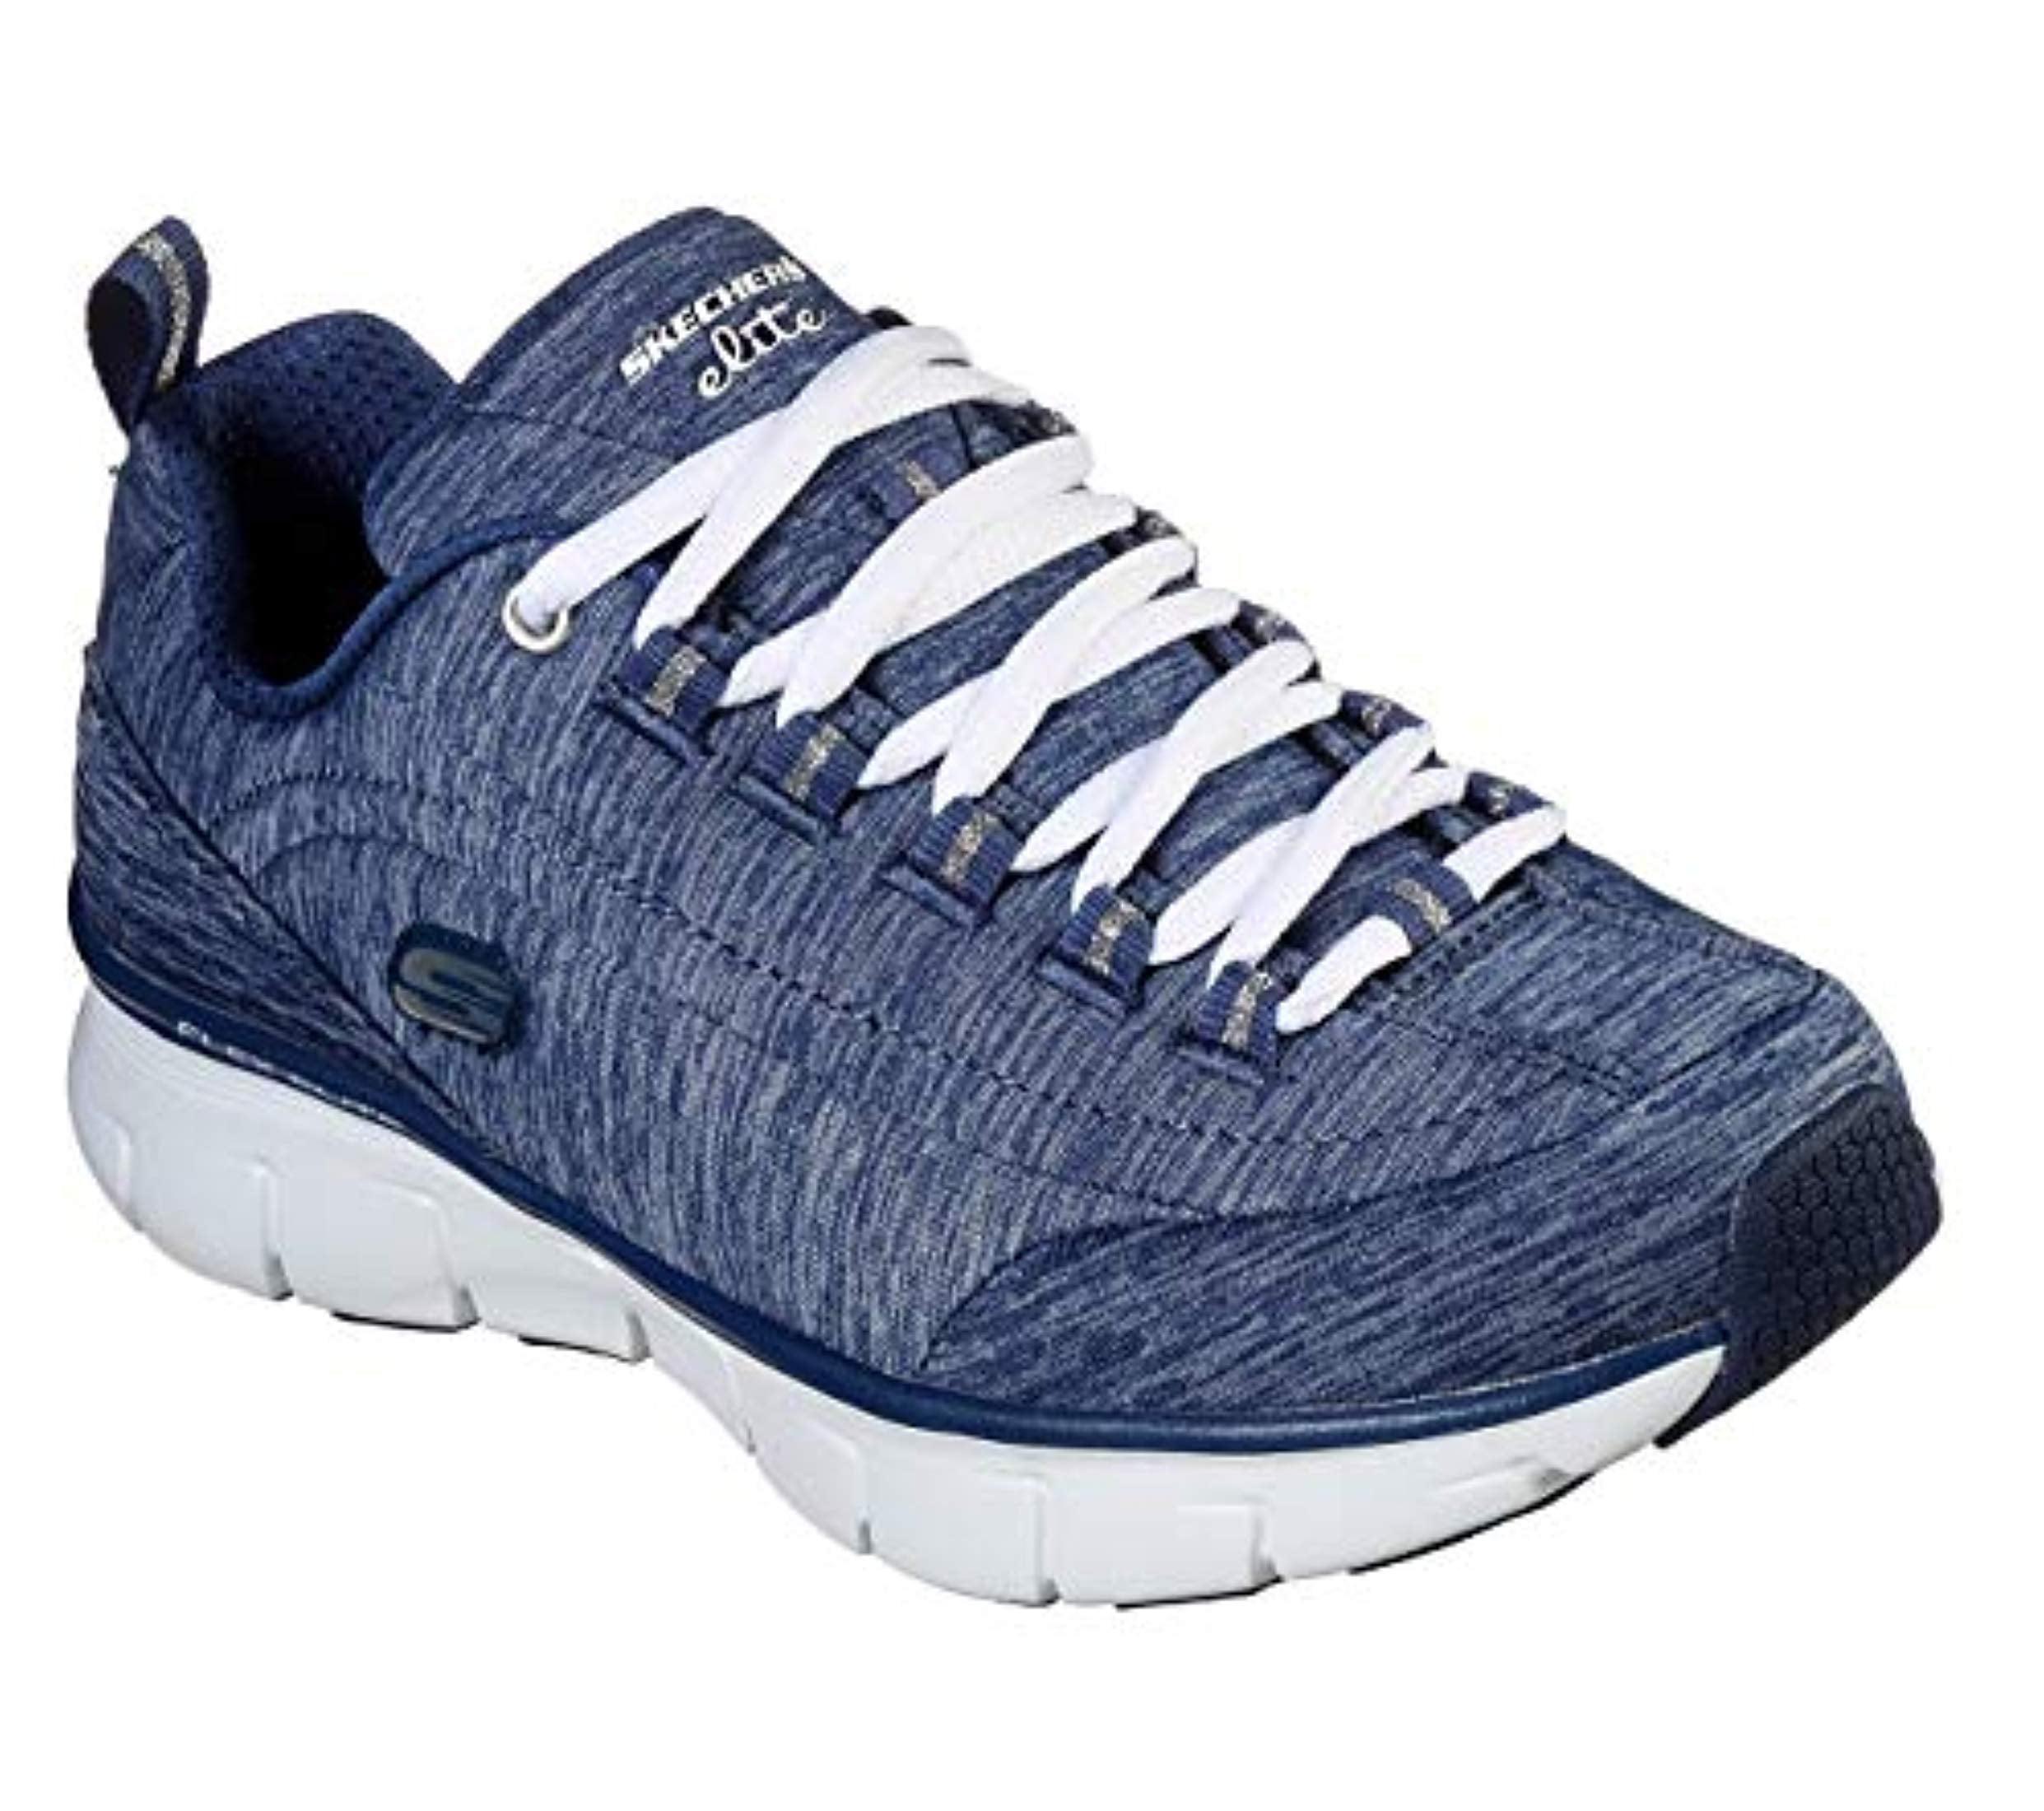 Synergy 3.0-Spellbound Sneaker